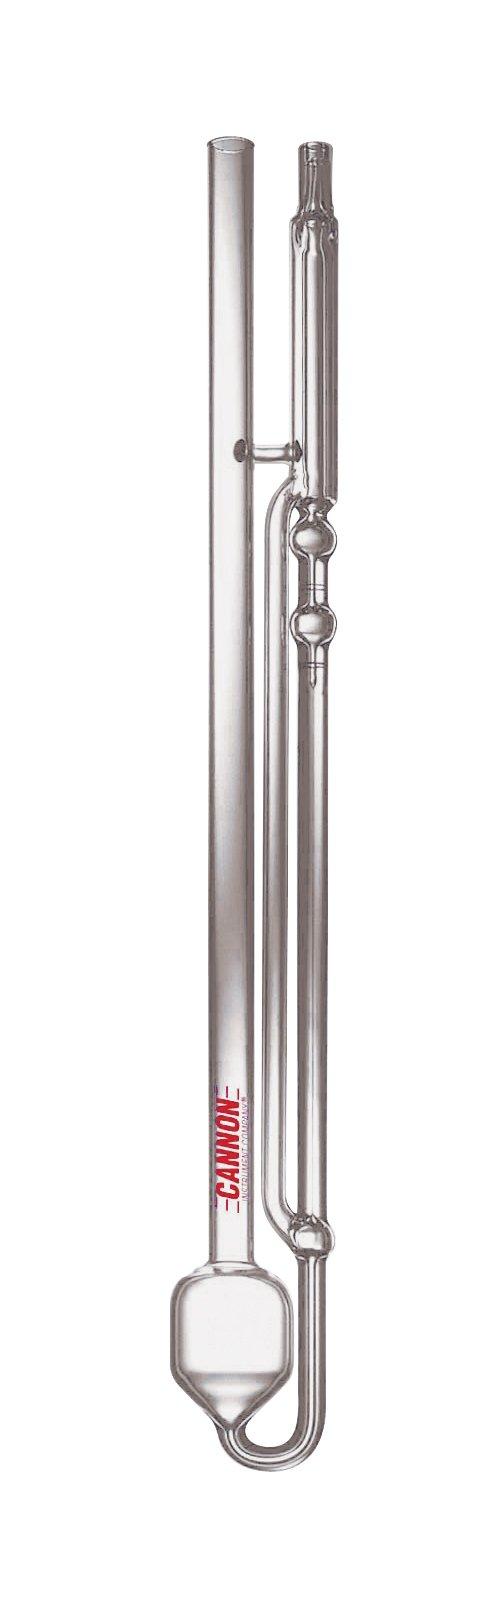 Cannon-Ubbelohde CUSMC-600 Calibrated Viscometer, 4,000 to 20,000 Centistokes Viscosity Range, Size 600